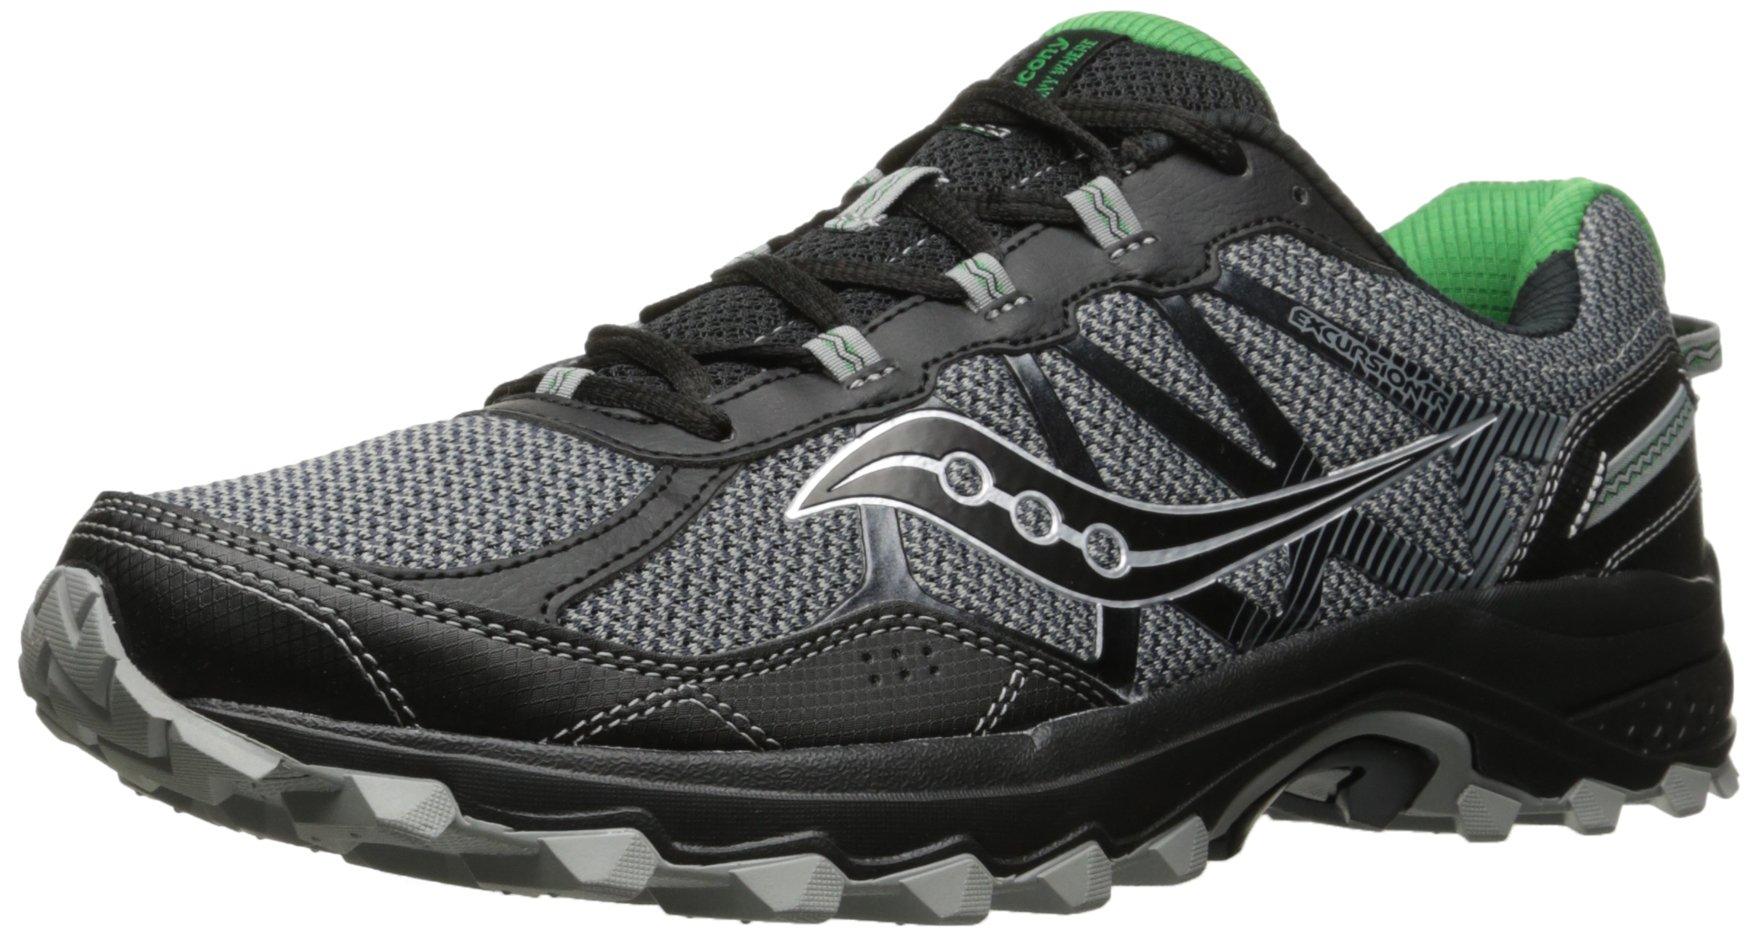 Saucony Men's Excursion TR11 Running Shoe, Grey Green, 7 Medium US